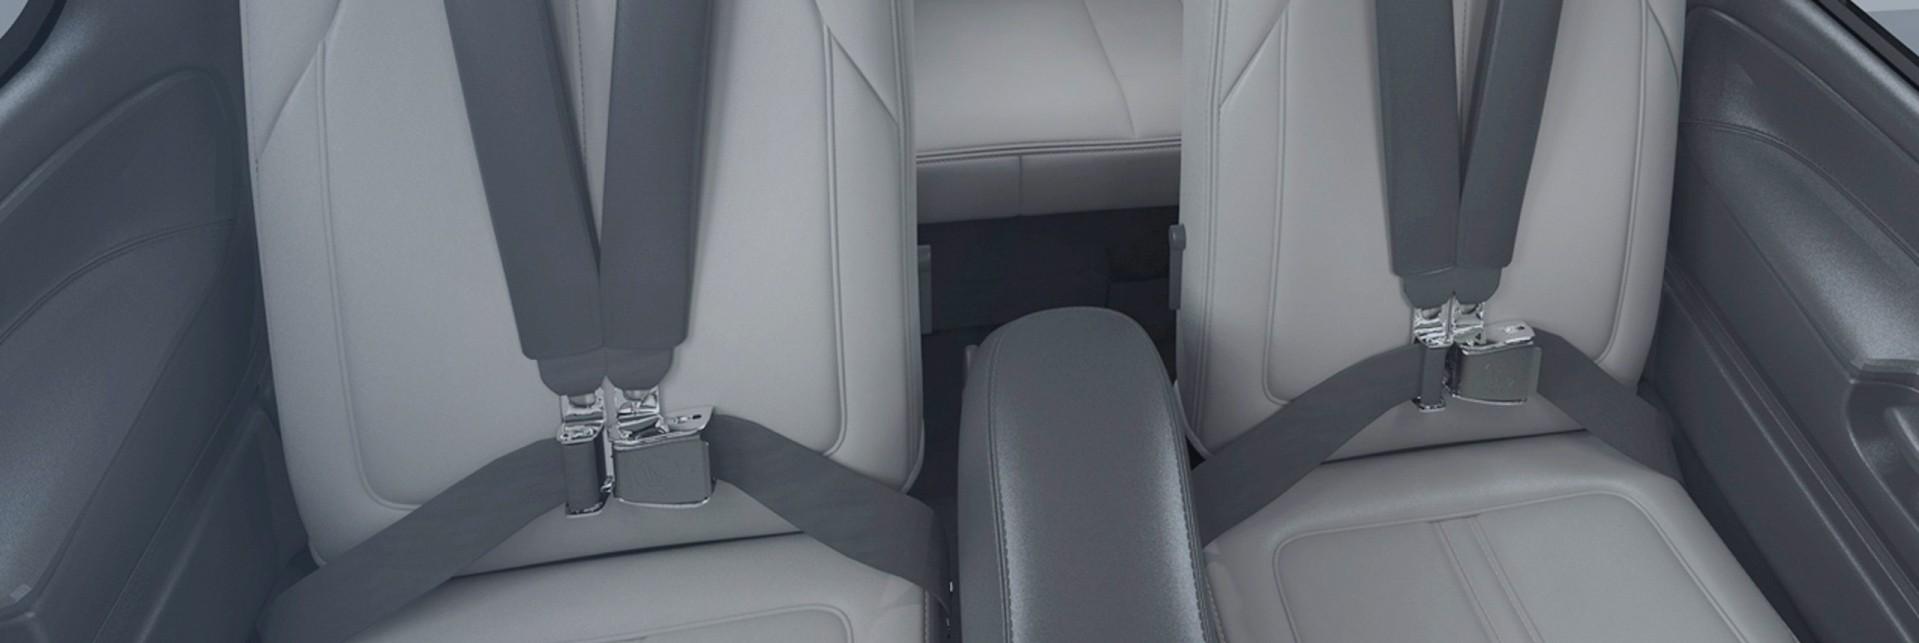 seat grey